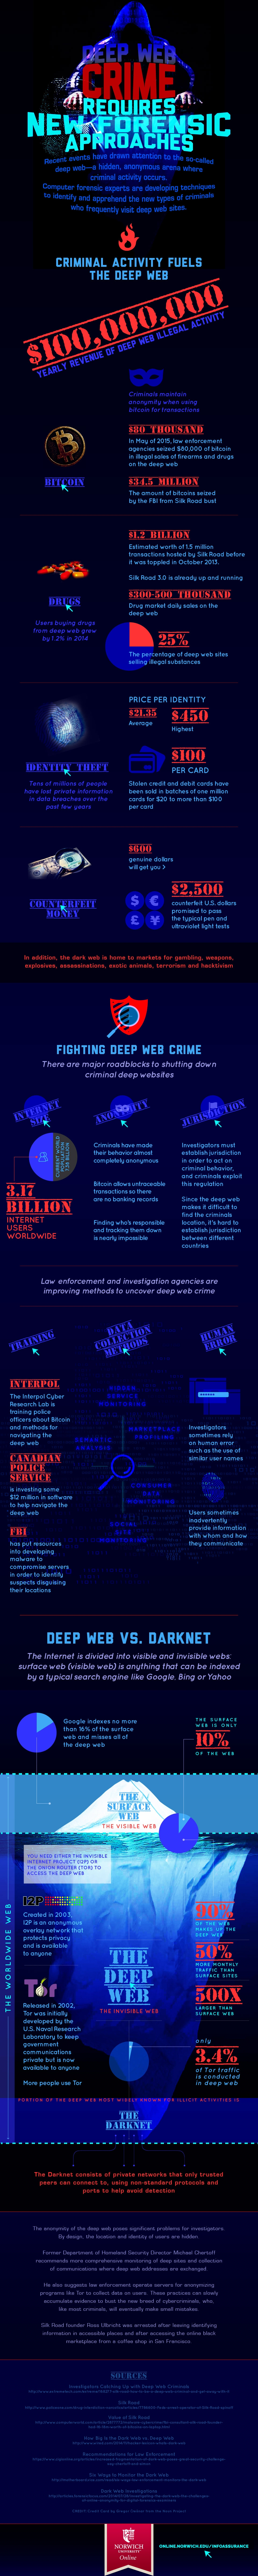 deep web infographic image